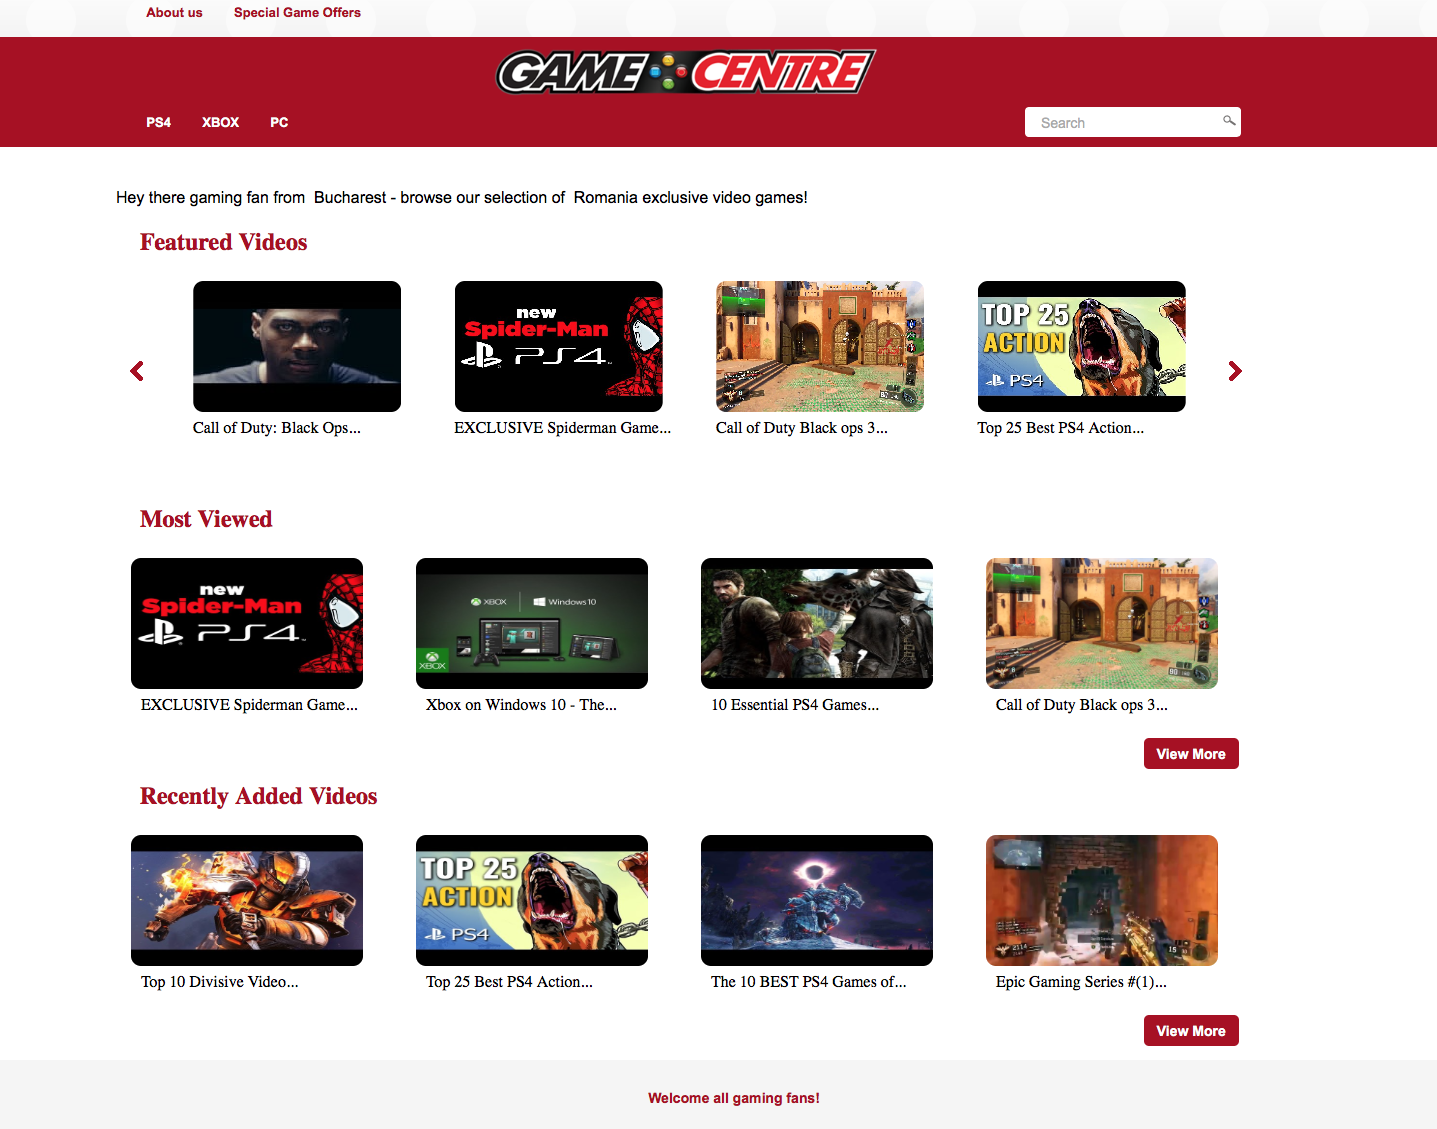 VydioX-Review-Bonuses-conyeco.com-LanzaPodcast-2